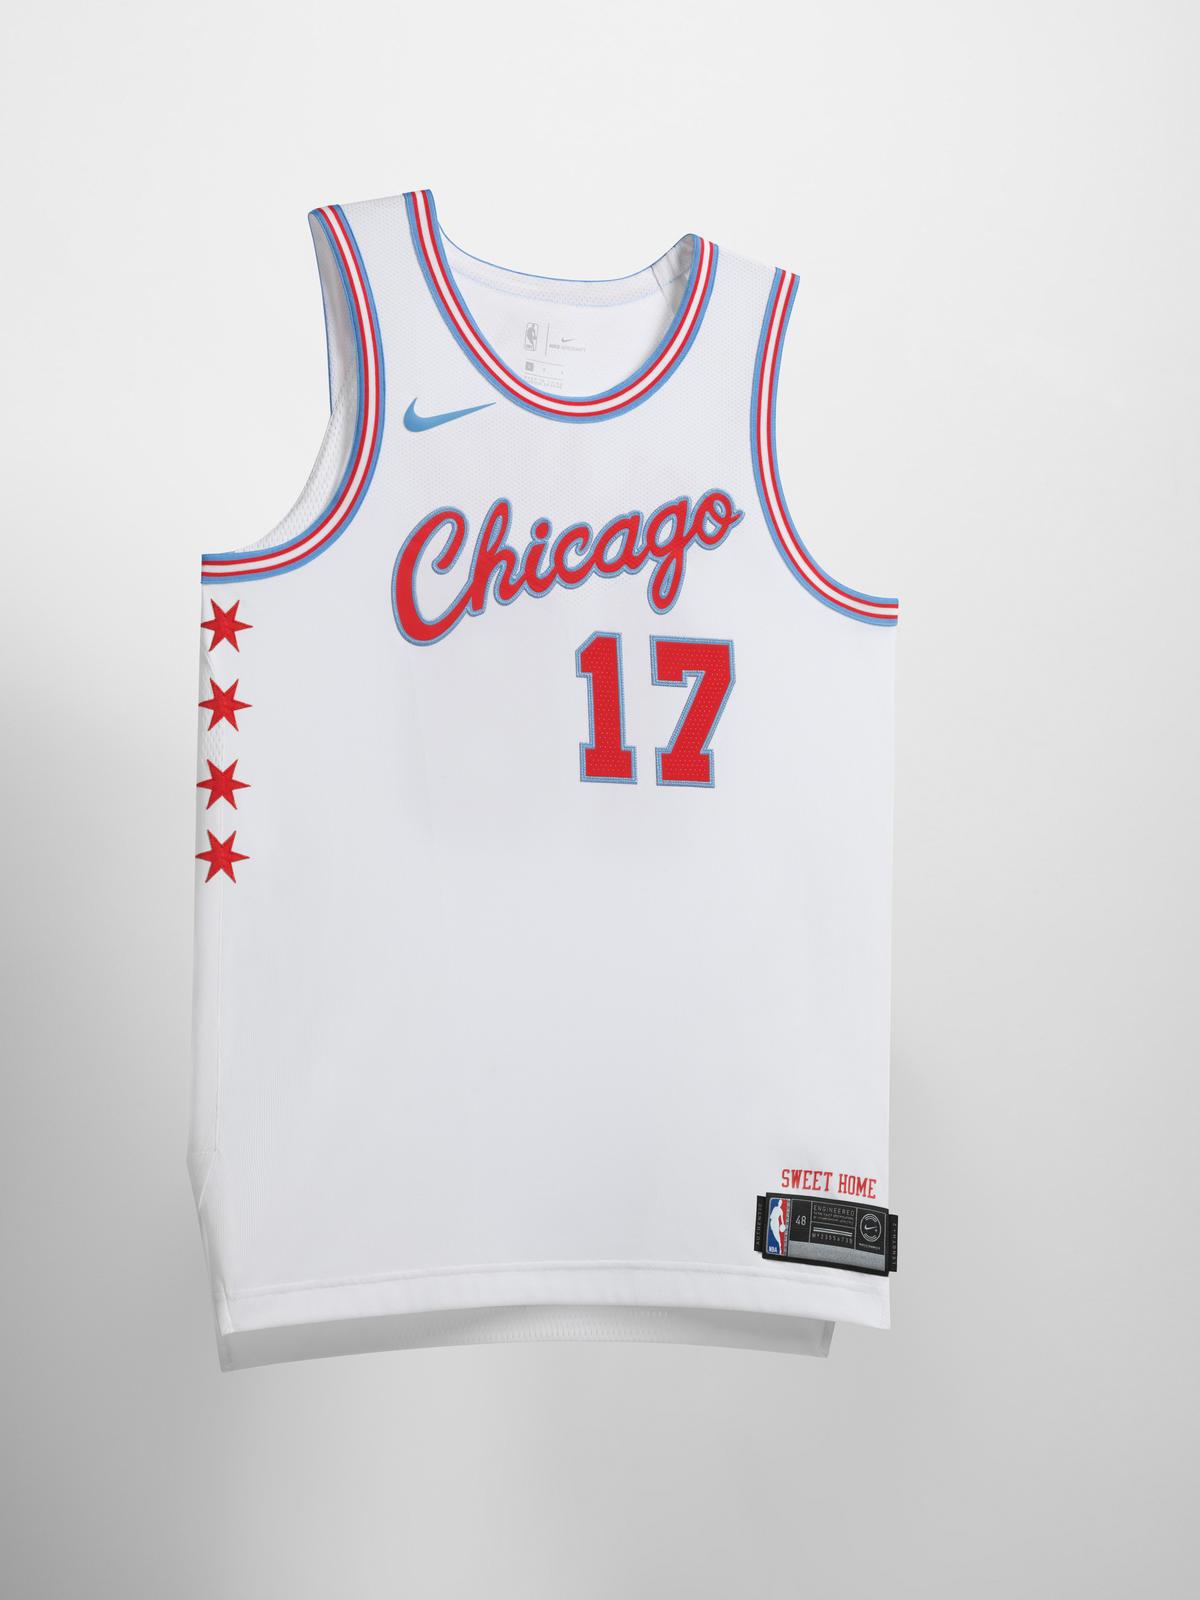 Nike_NBA_City_Edition_Uniform_Chicago_Bulls_0115_native_1600